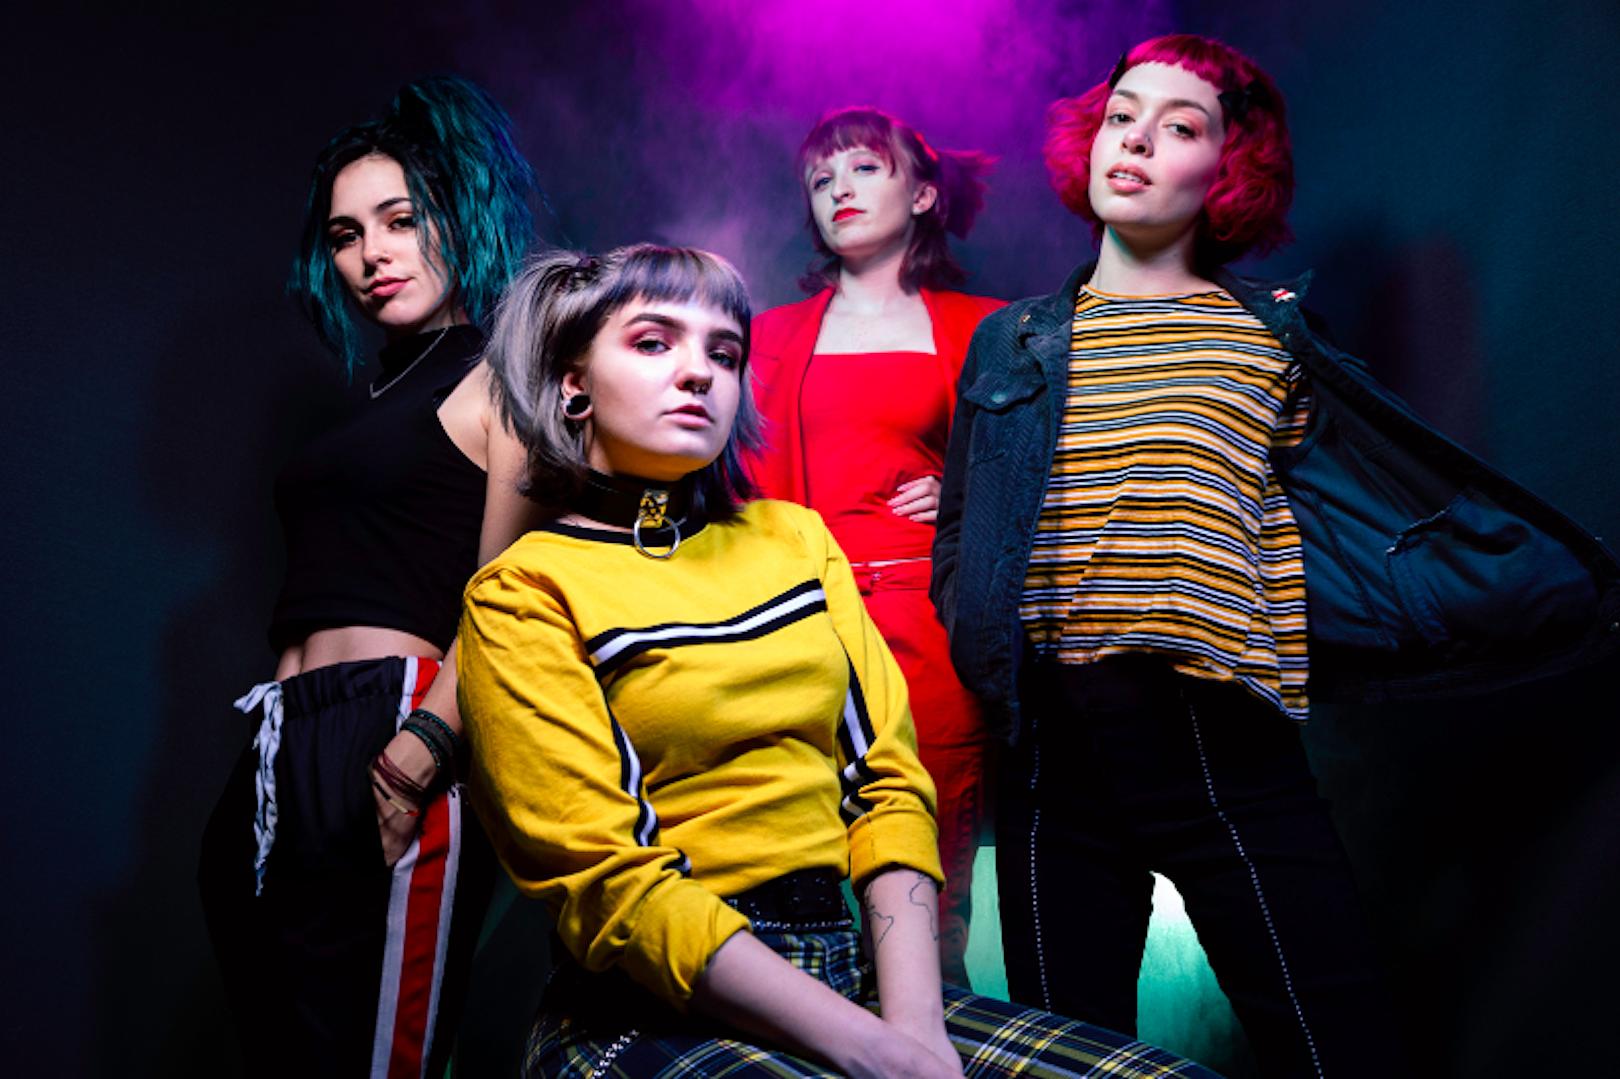 Doll Skin Announce New Album + Drop Vengeful Single 'Mark My Words'